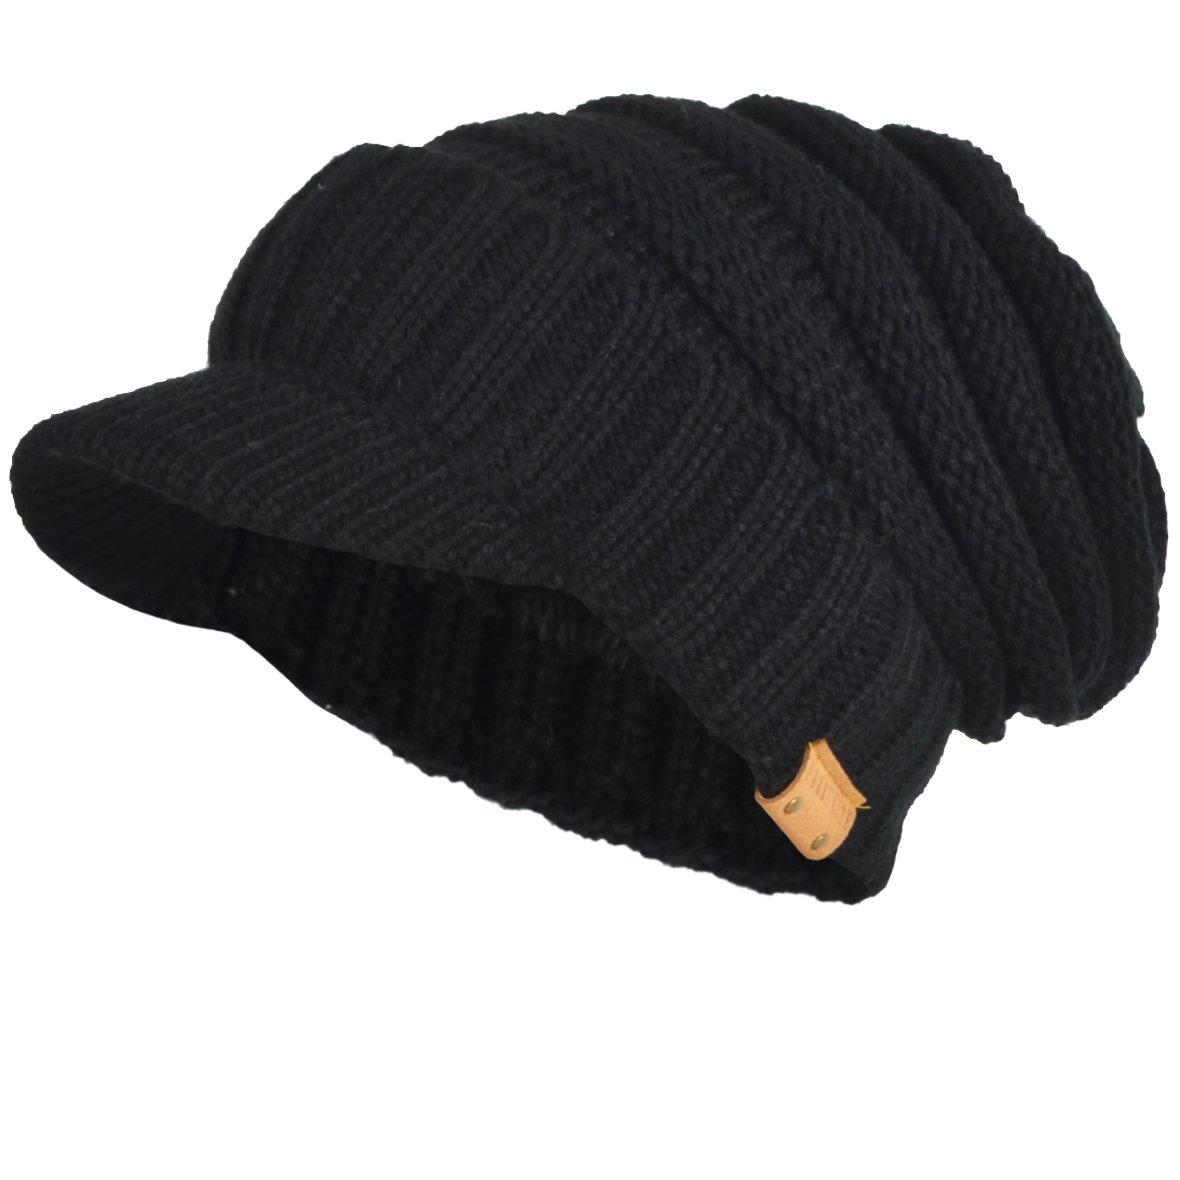 34e3df7da2 Men's Knit Cable Newsboy Cap Cadet Cabbie Peak Cap Winter Hat (Thick Black)